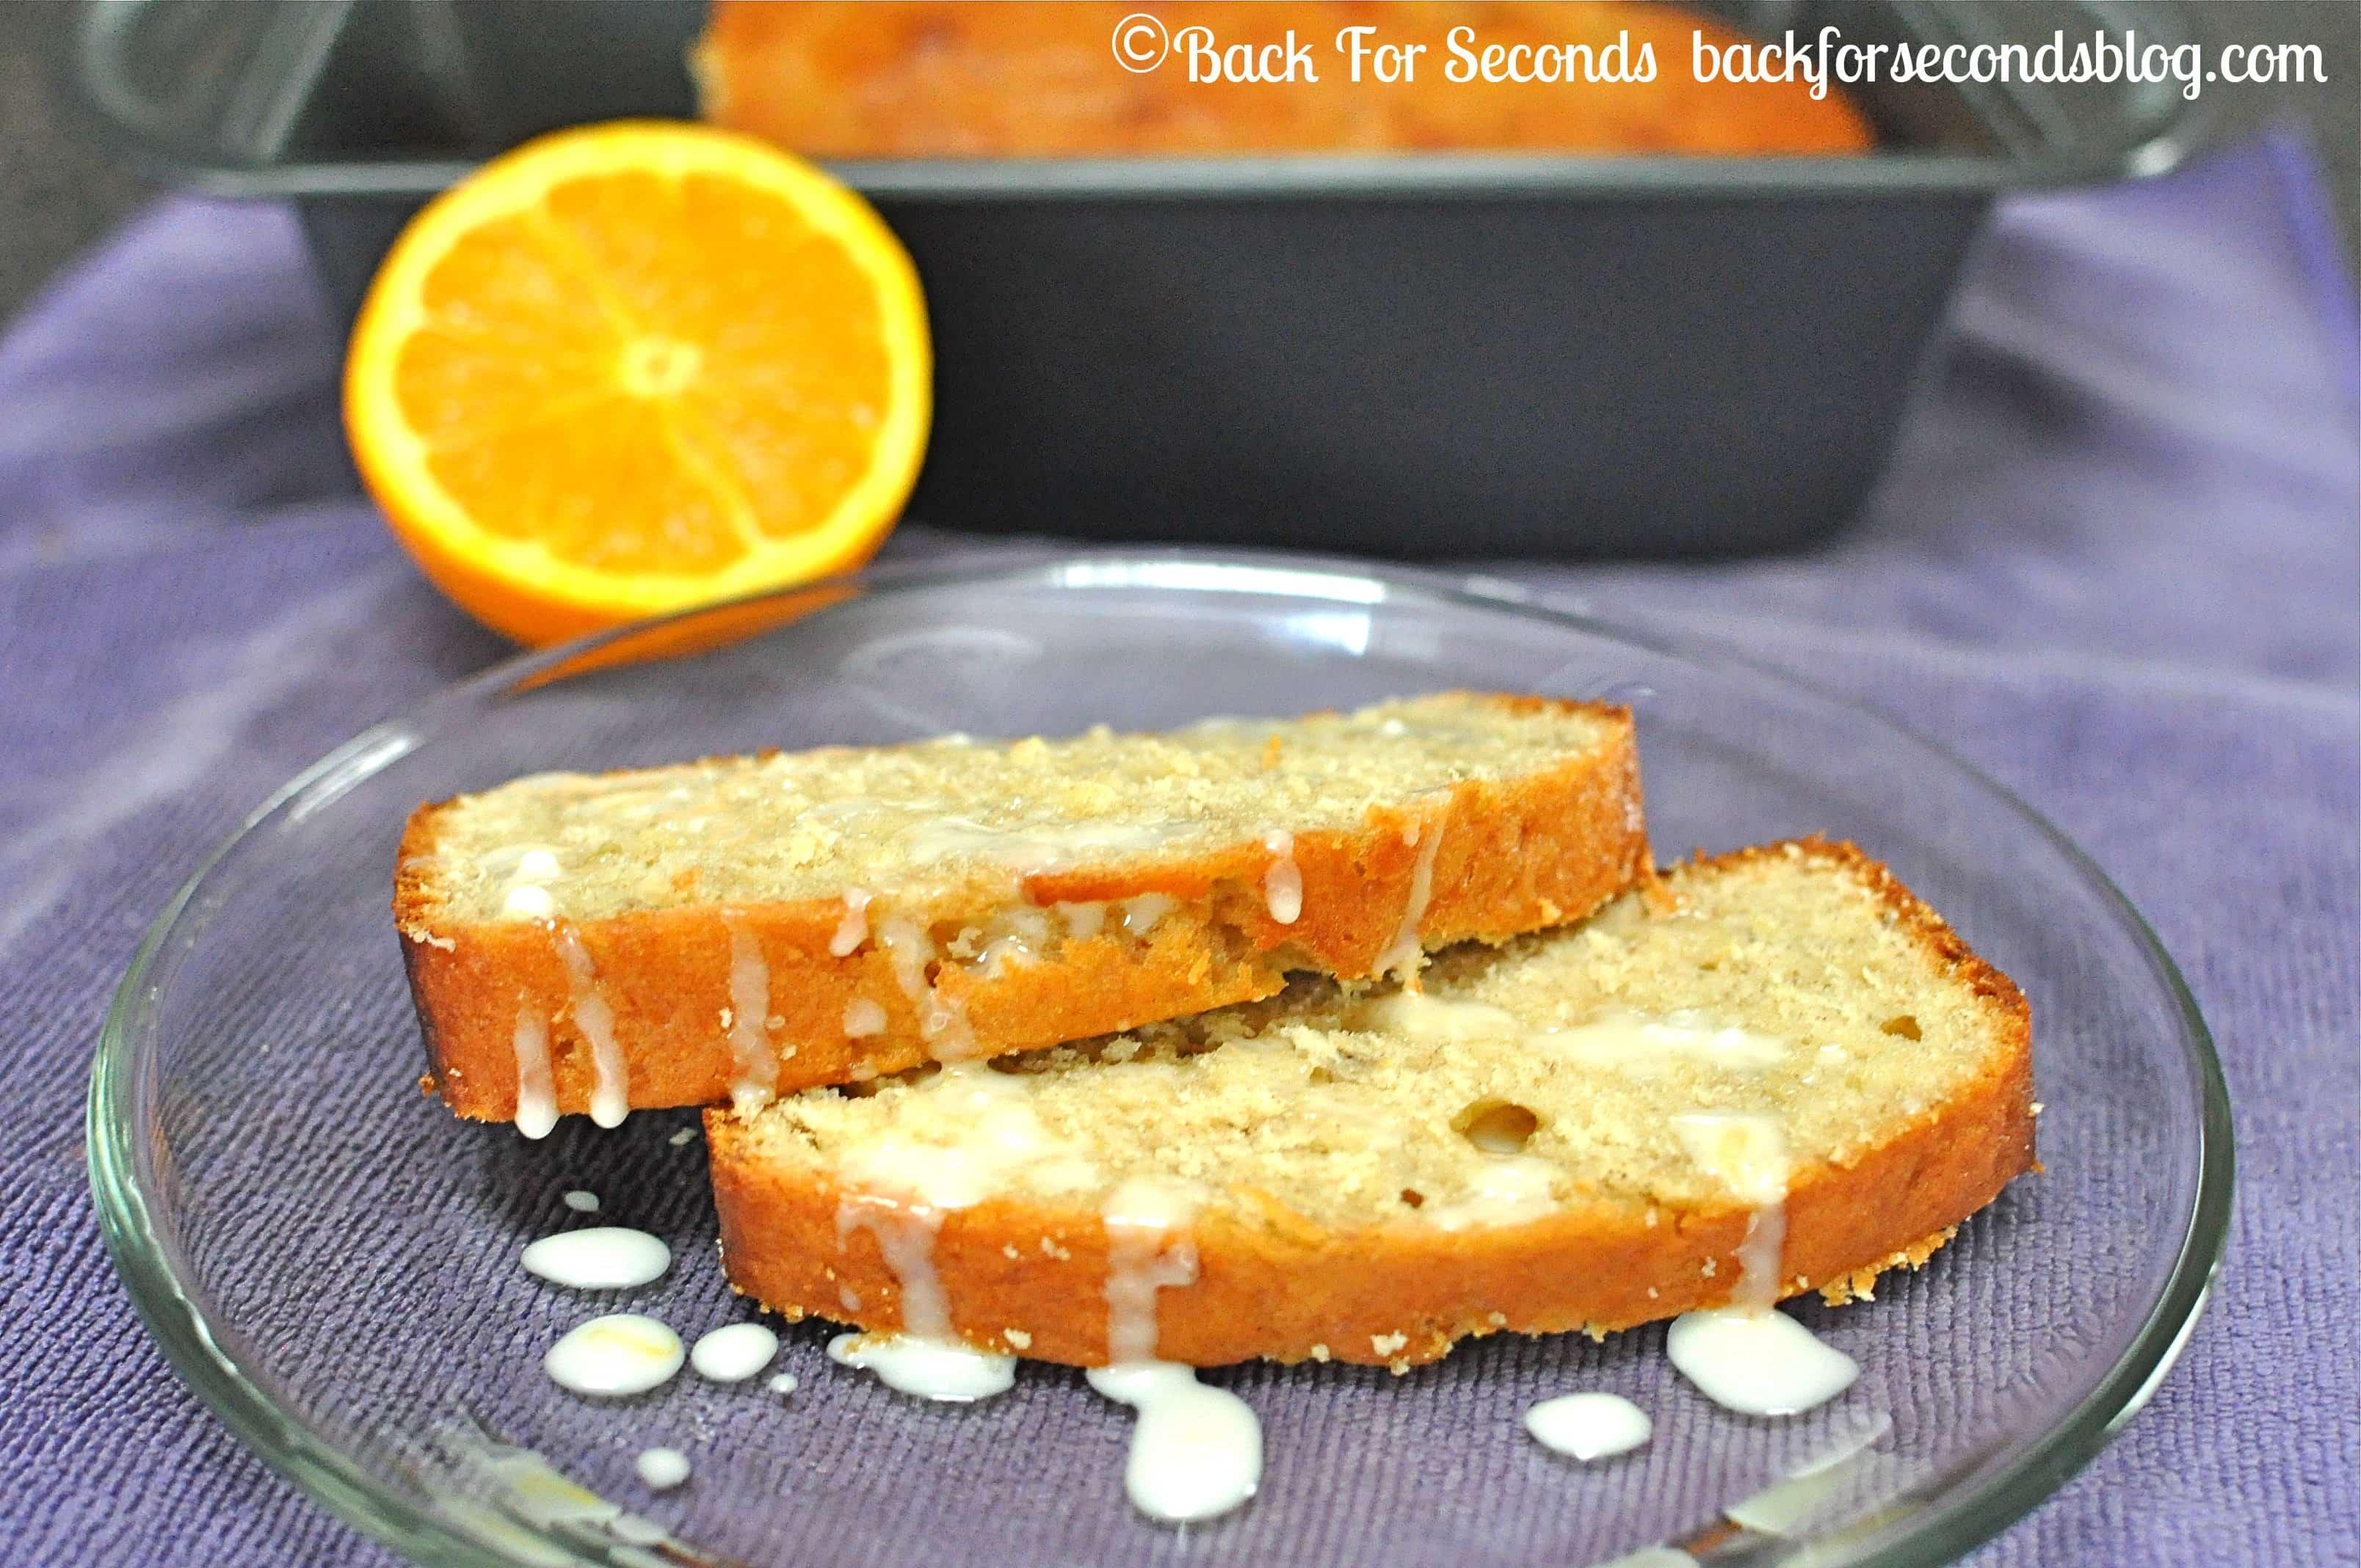 Banana Orange Bread by Back For Seconds  #breakfast #recipe #quickbread #banana #orange #glaze